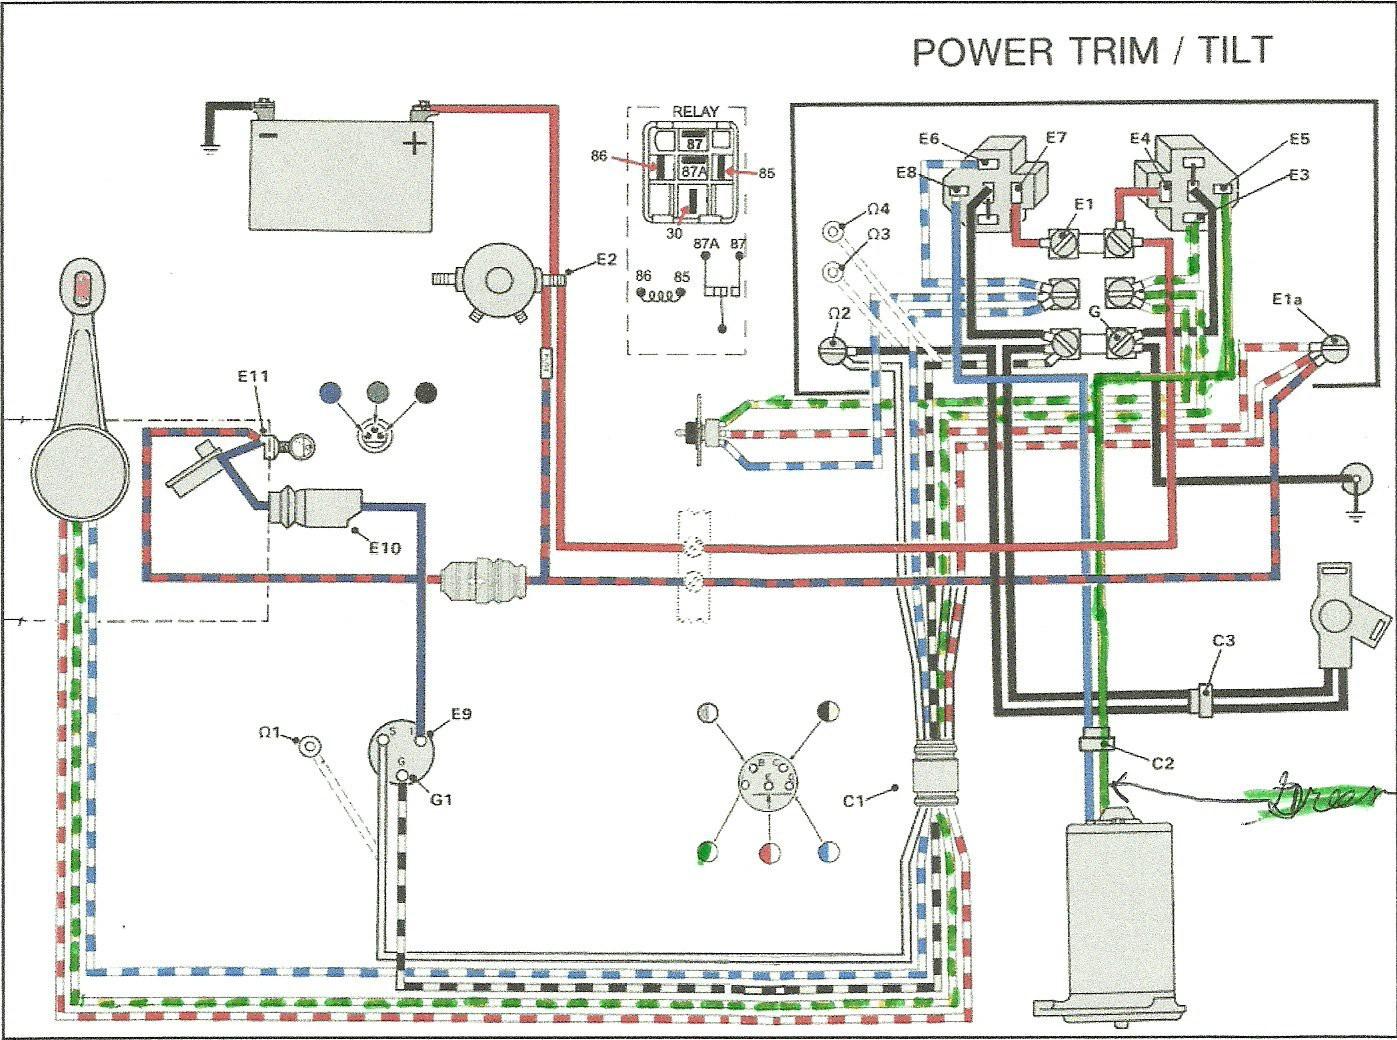 Cmc Power Trim Wiring Diagram - 12.9.kenmo-lp.de •